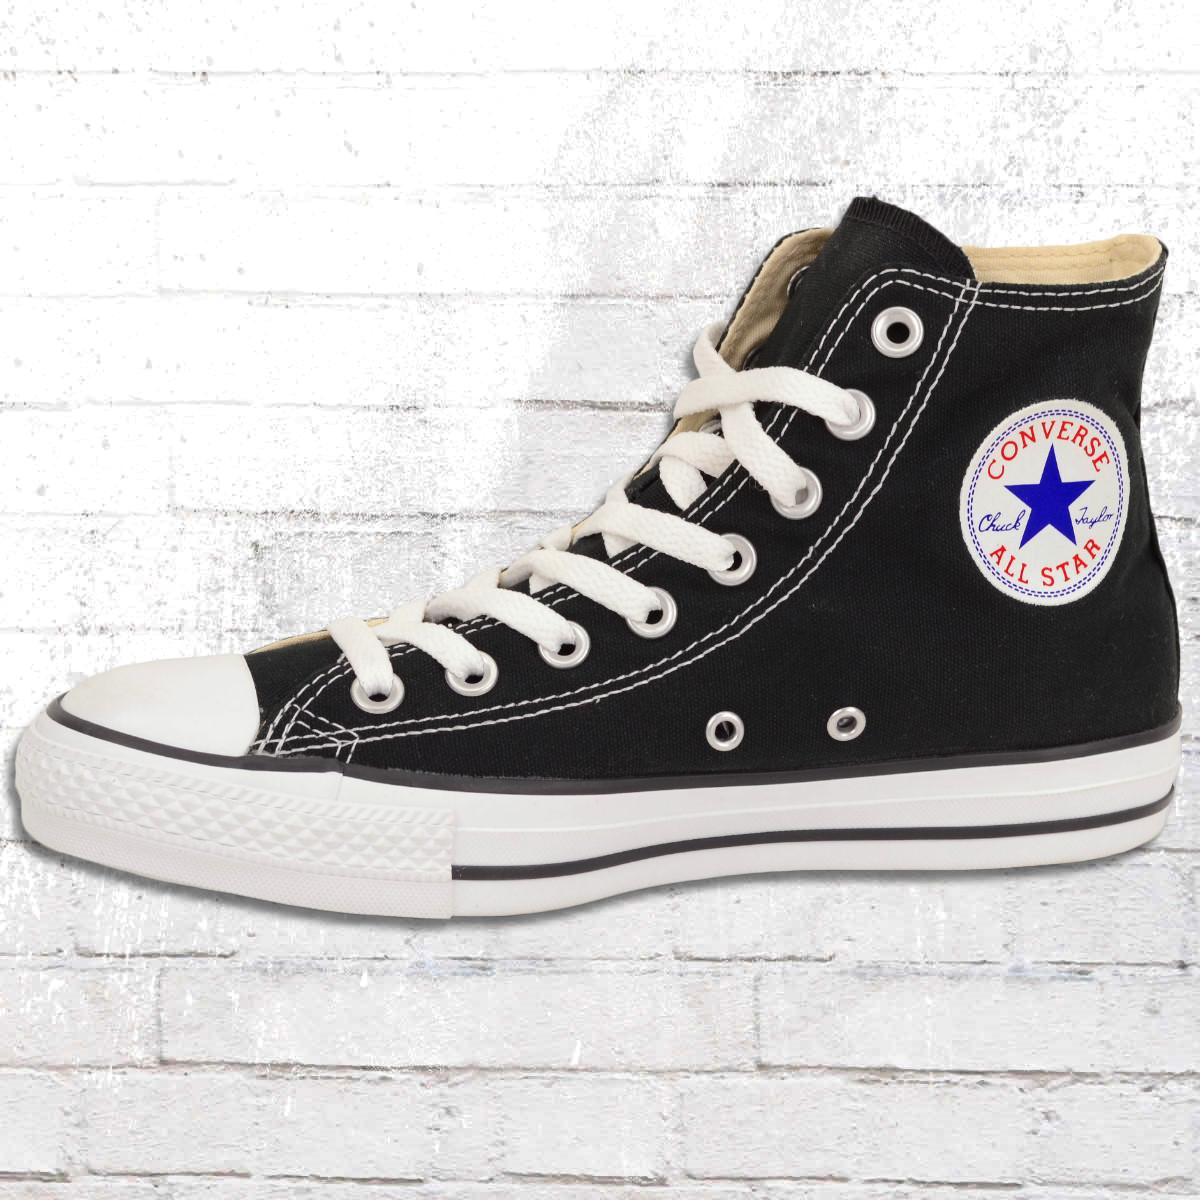 031ad9851b86d9 Converse Chucks Shoes M 9160 black. ›‹ «